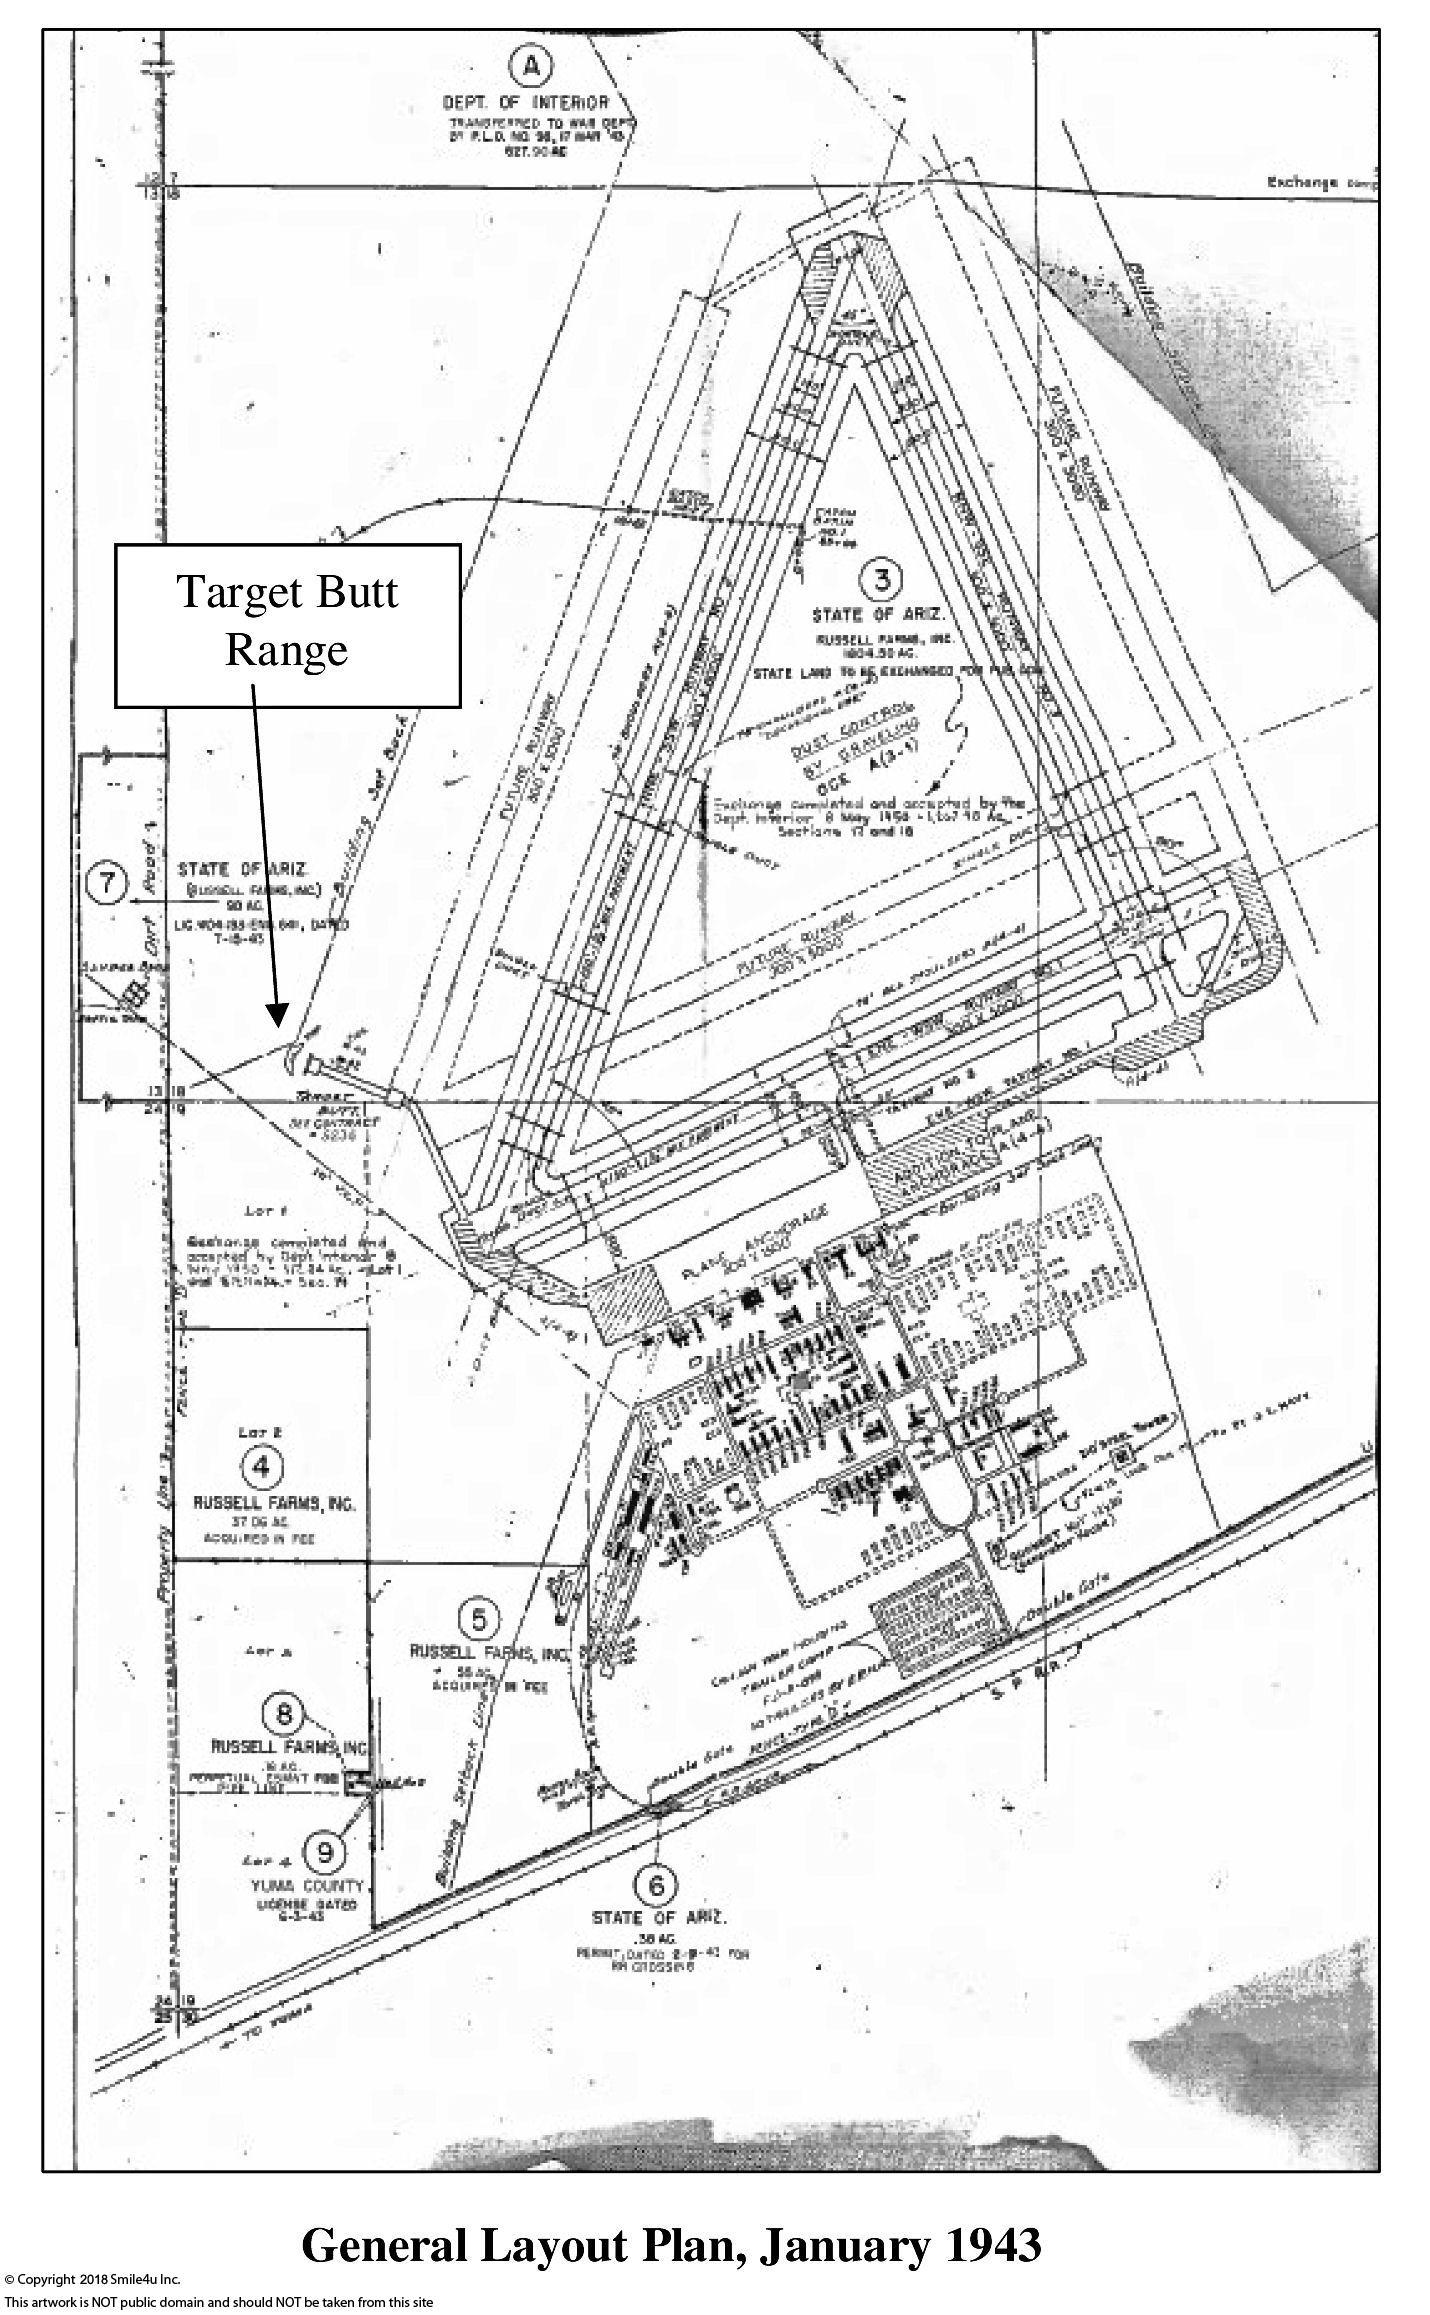 898472_watermarked_Dateland_AAF_general_layout_plan_jan_1943.jpg